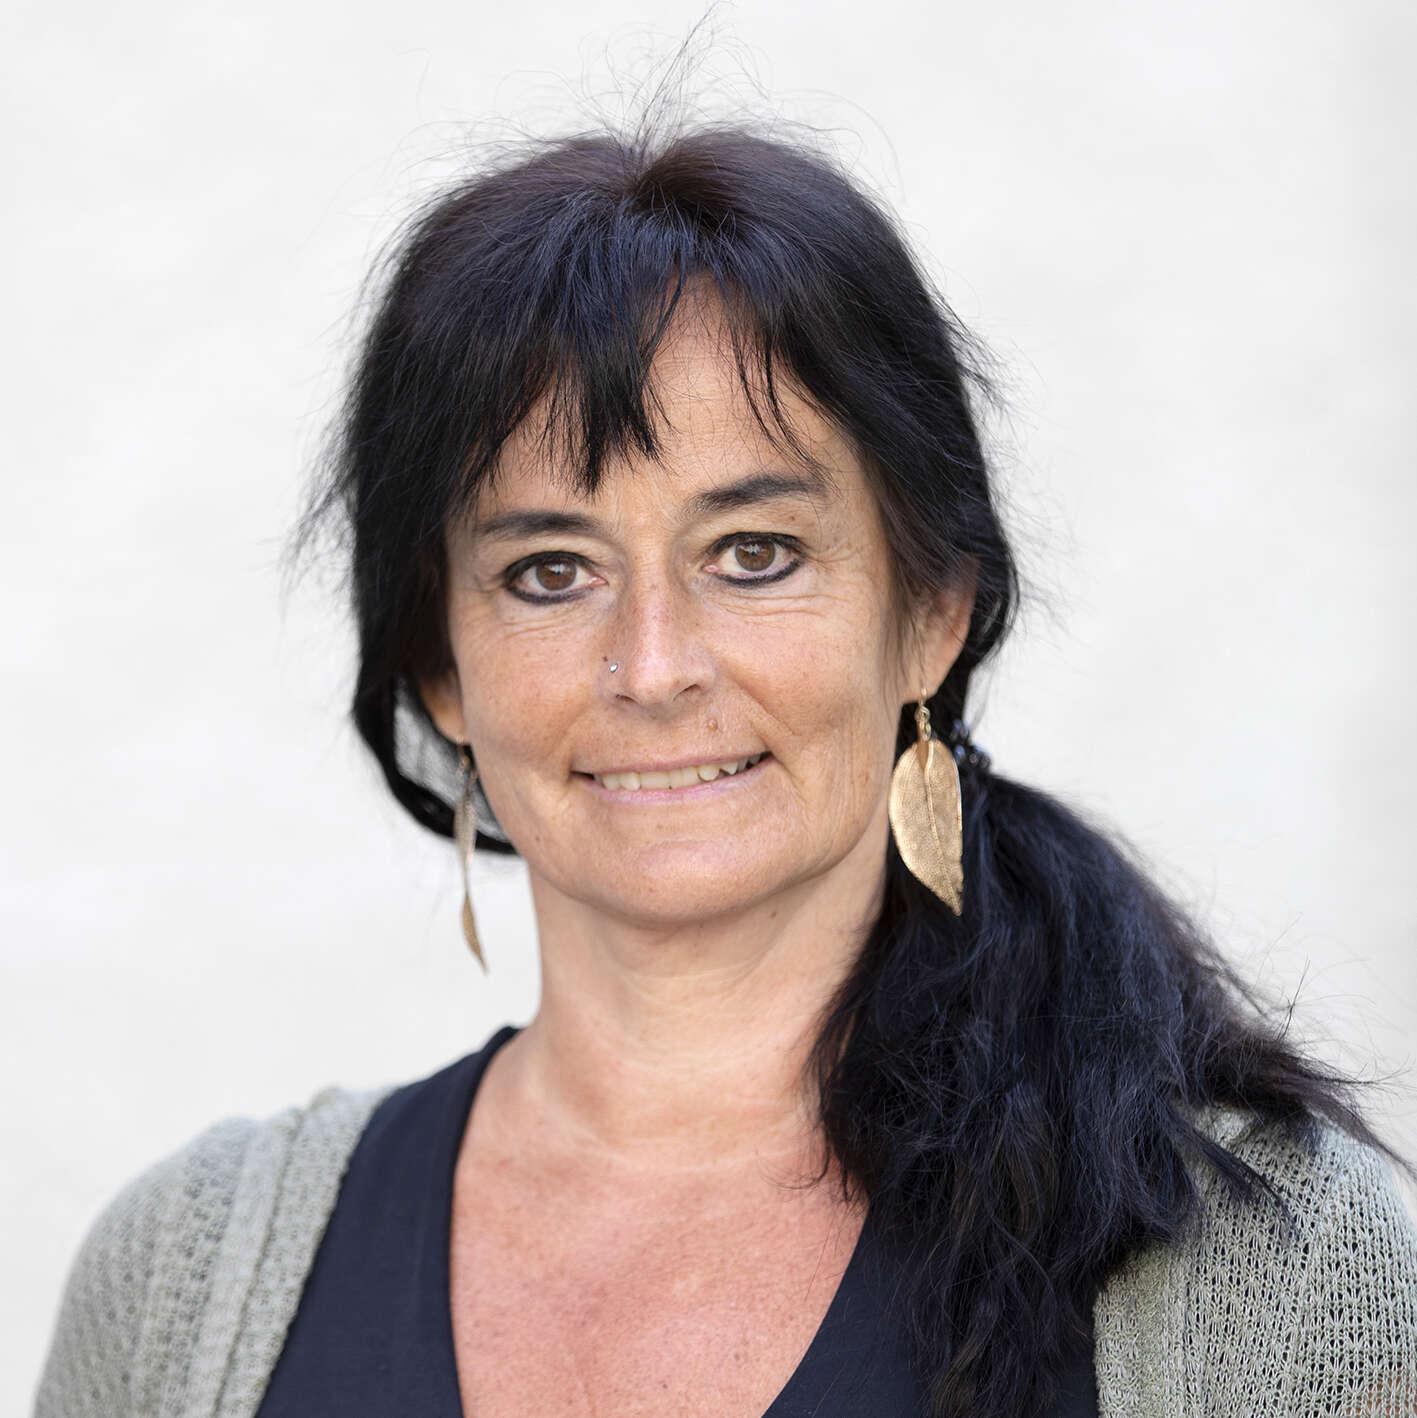 Karin Iten